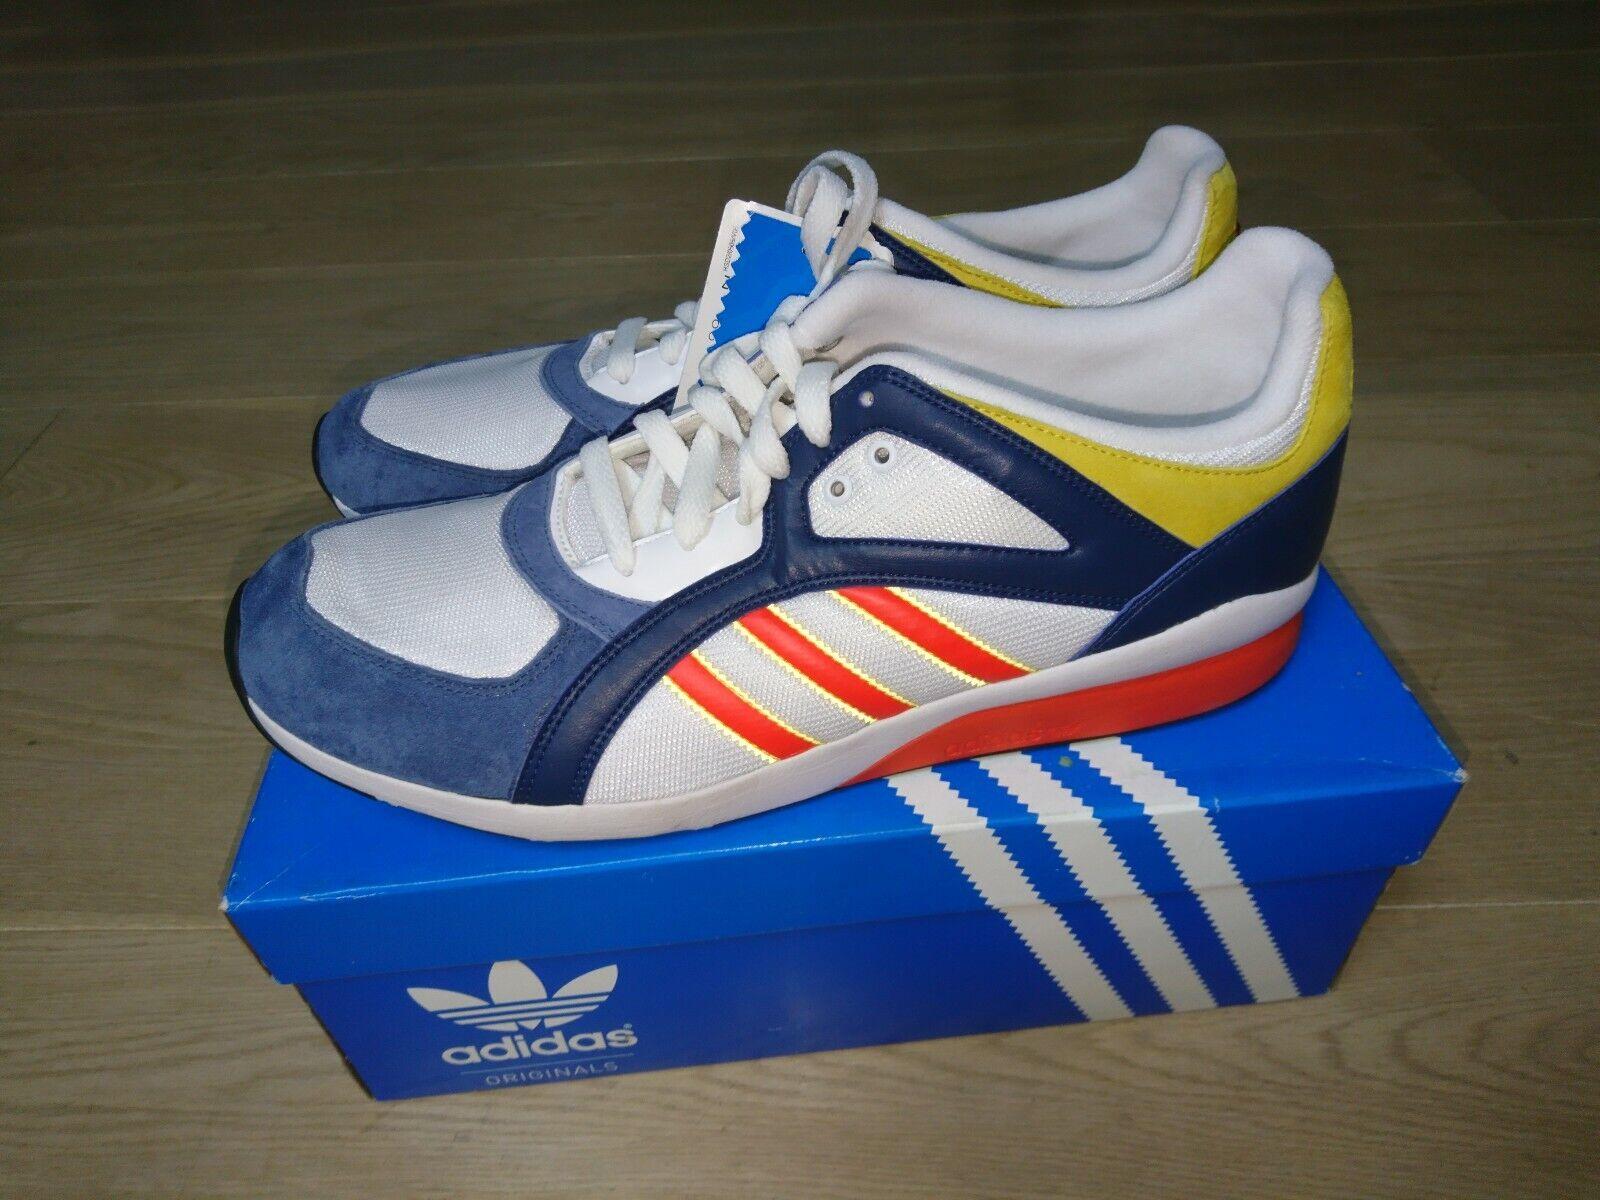 Adidas Zx90s Run Gr. 46,5 099809